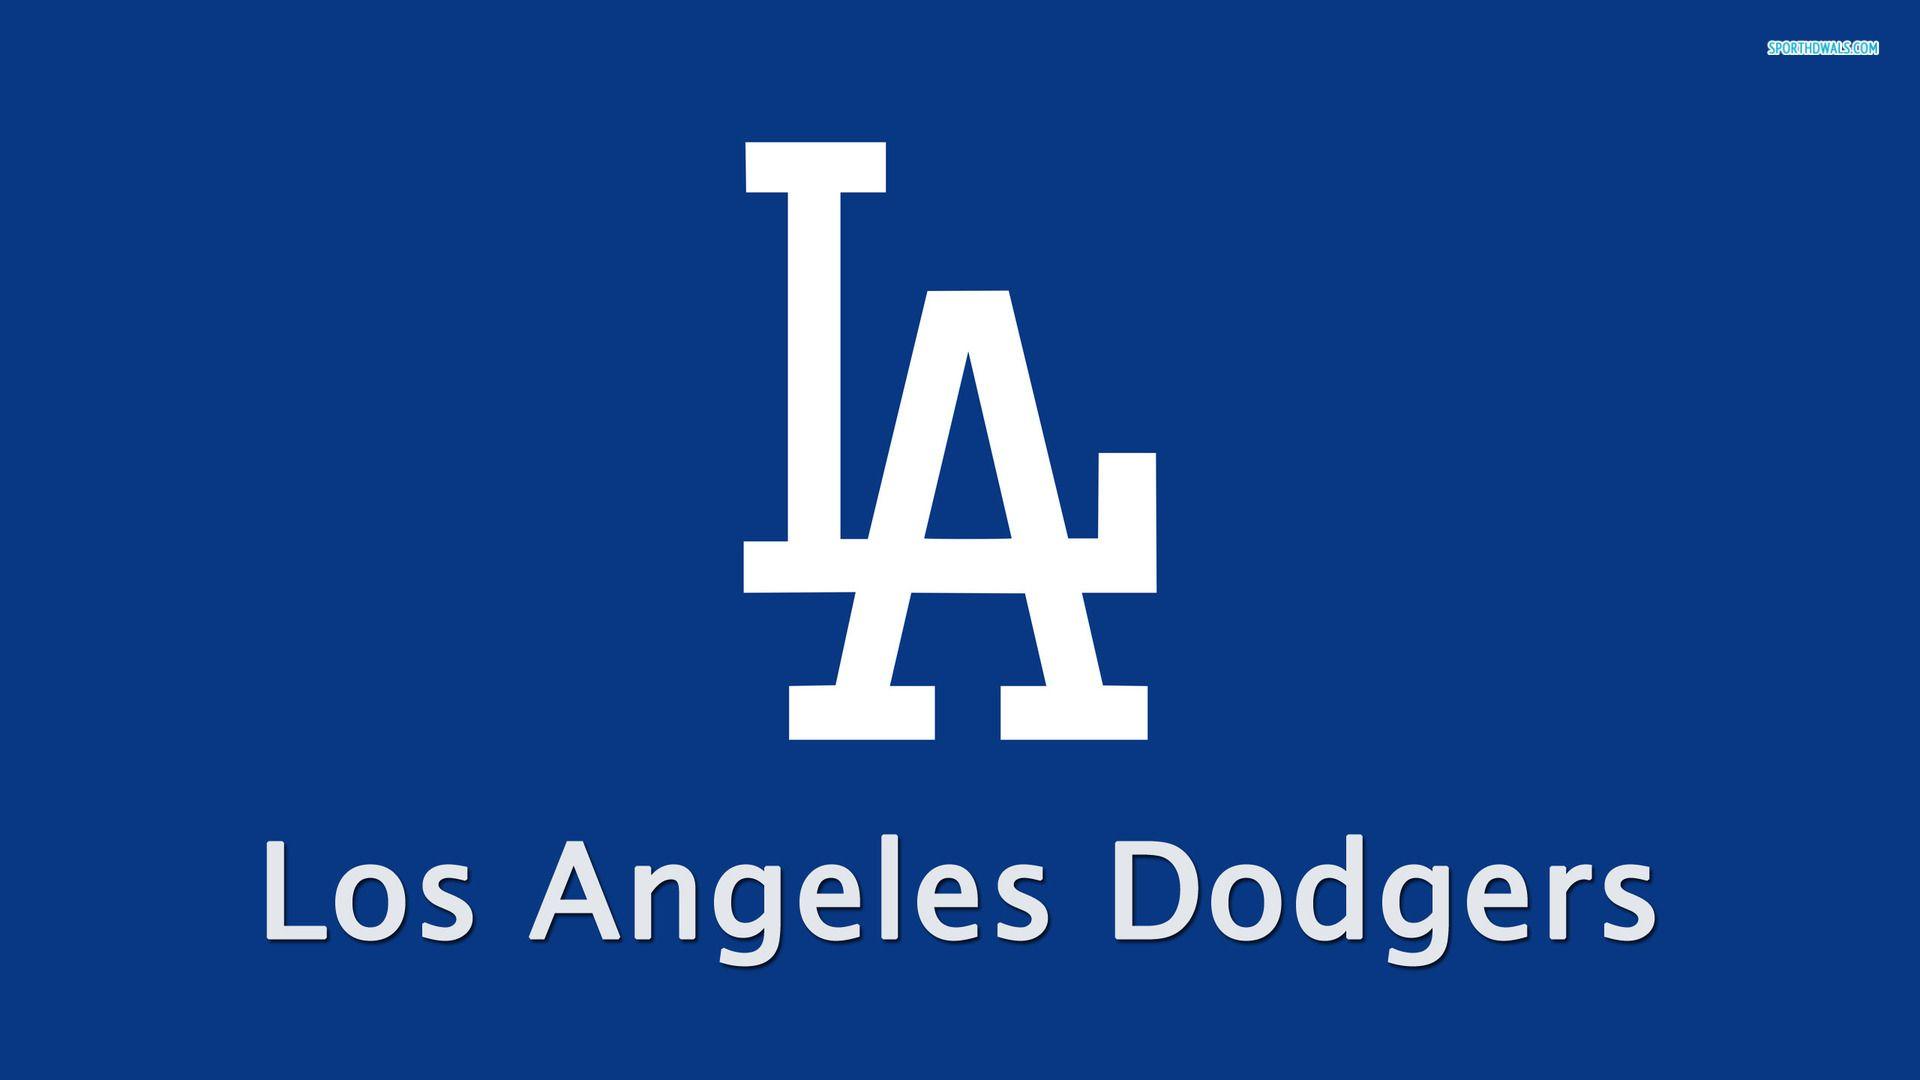 Dodgers Cool Wallpaper